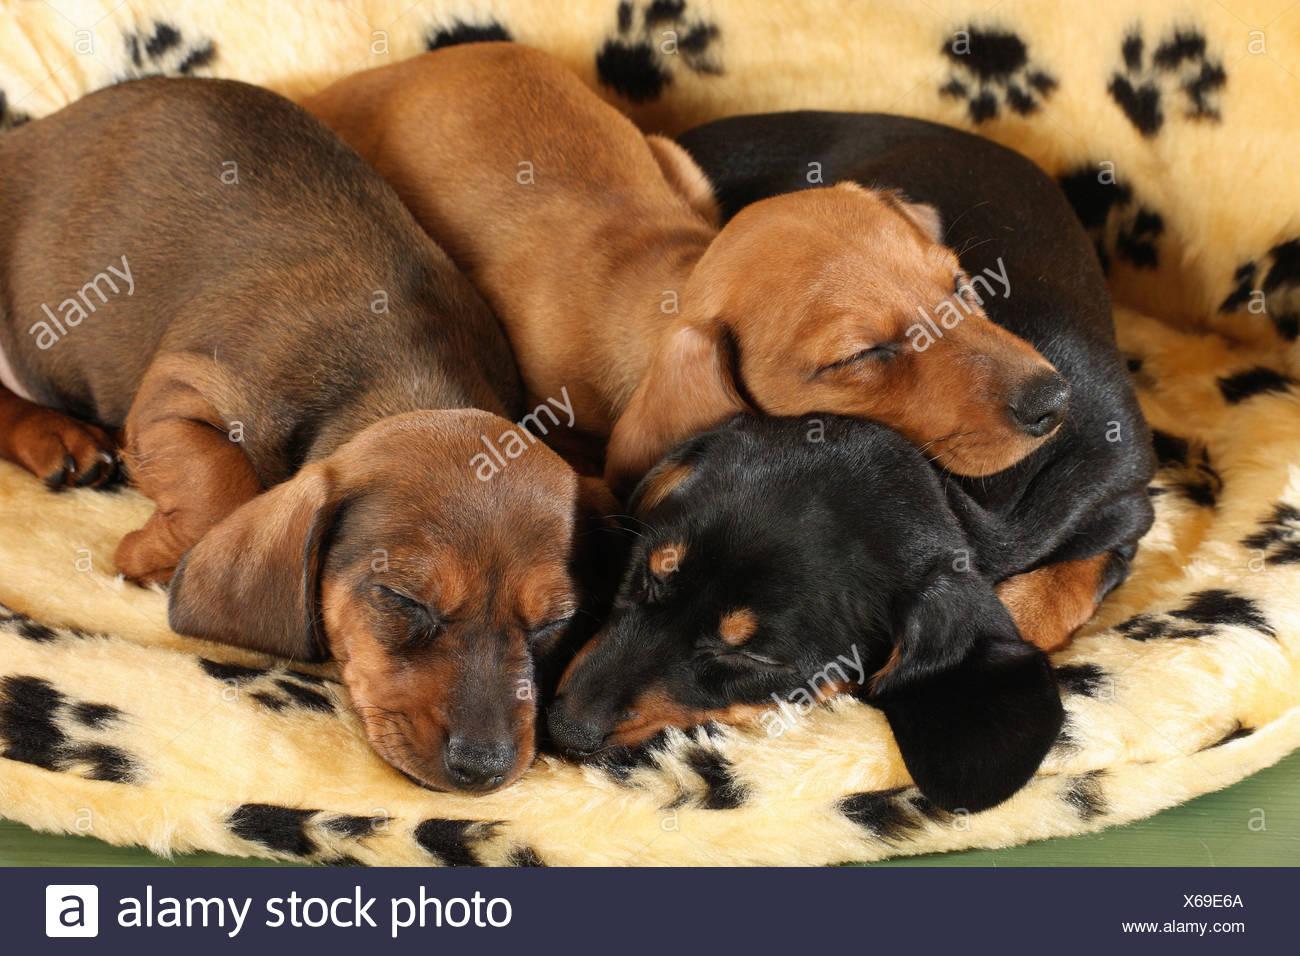 Miniature Dachshund Dog Four Puppies Sleeping Stock Photo Alamy